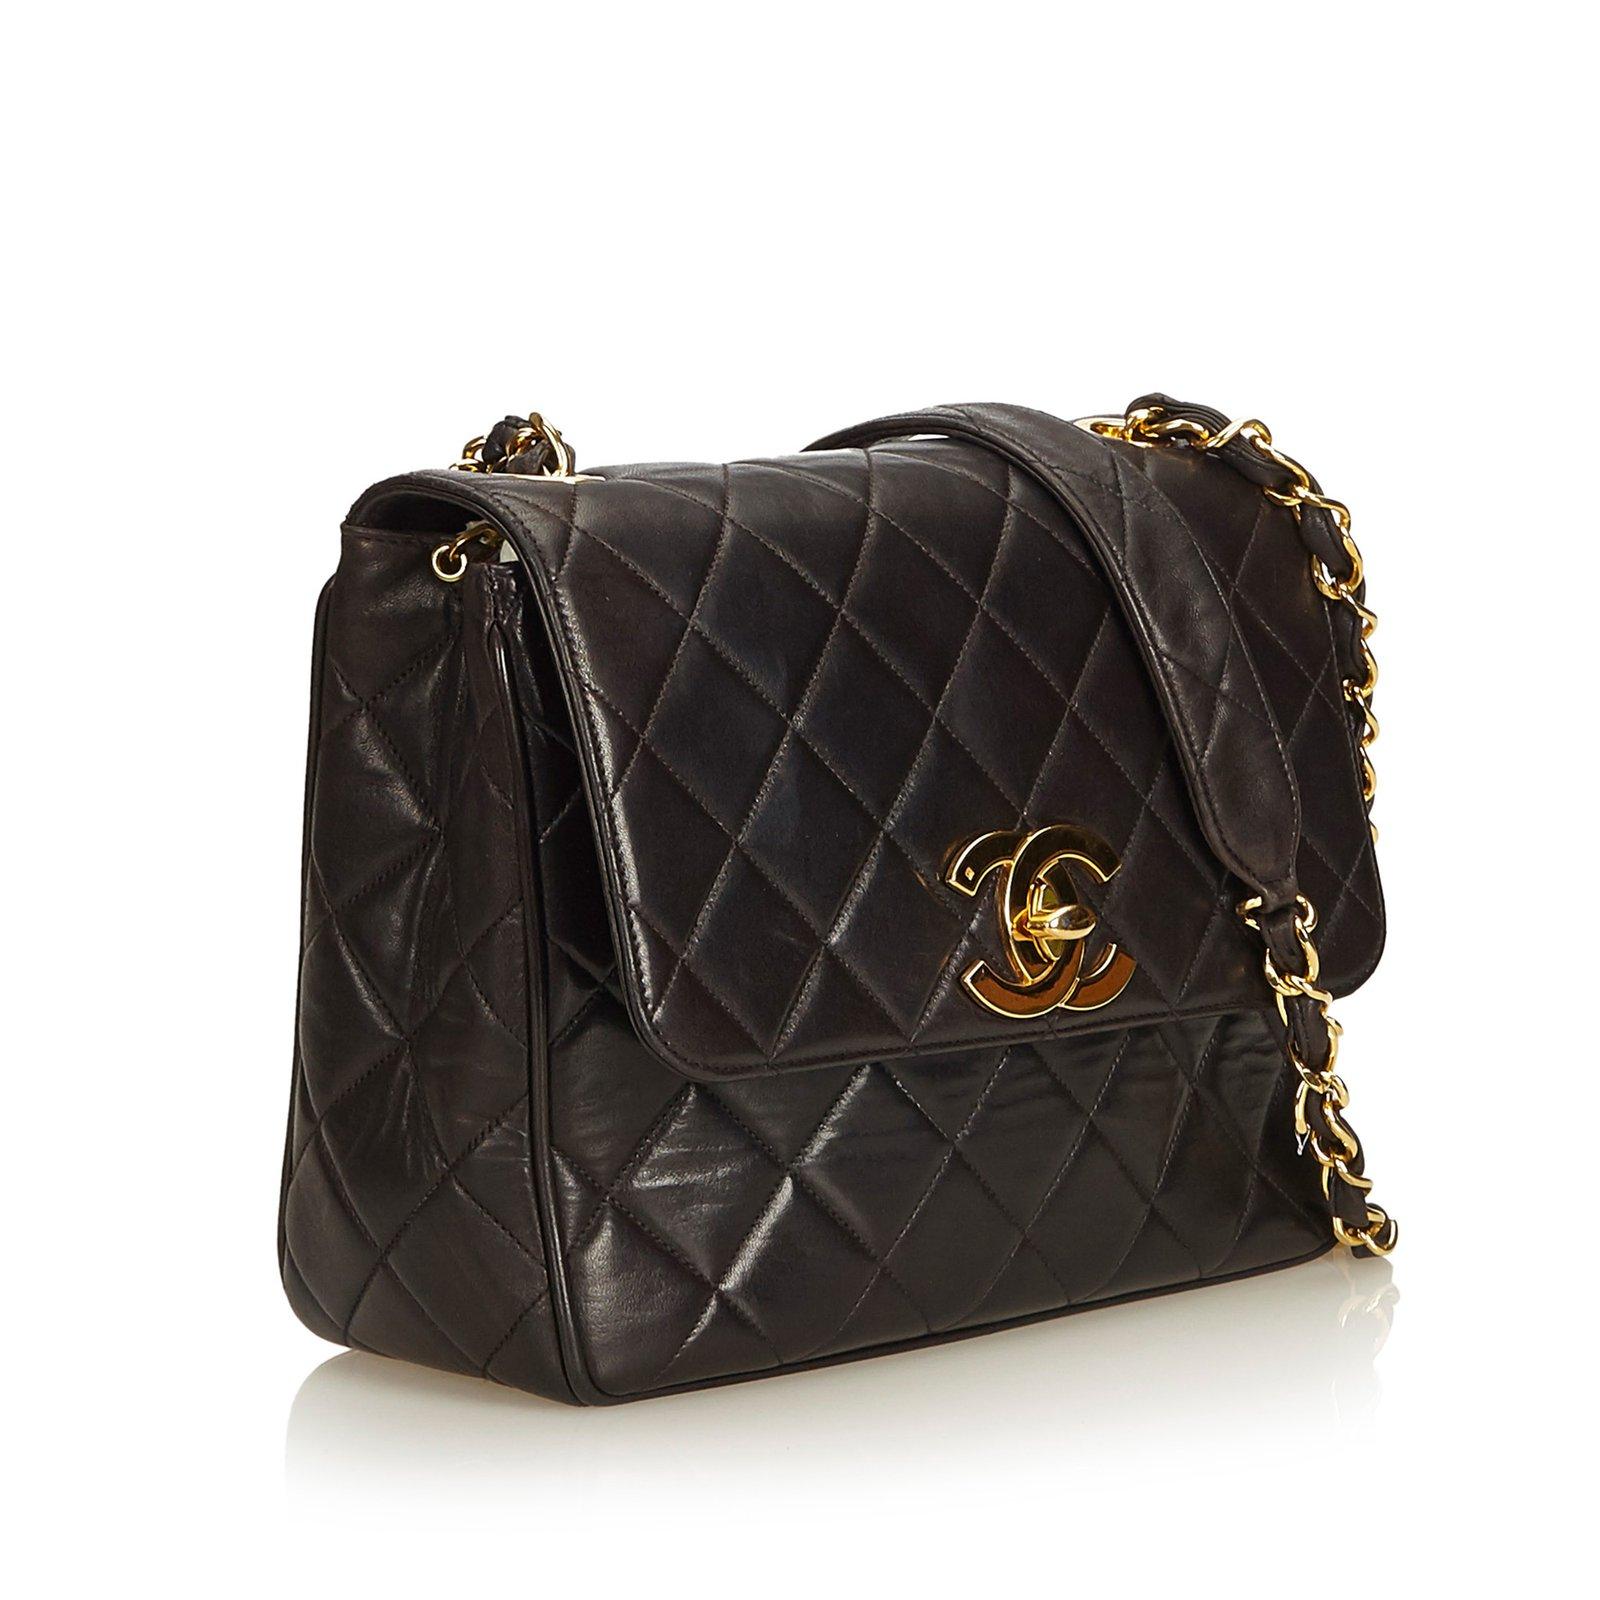 485107c720d3 Chanel Matelasse Lambskin Chain Crossbody Flap Bag Handbags Leather Black  ref.100130 - Joli Closet